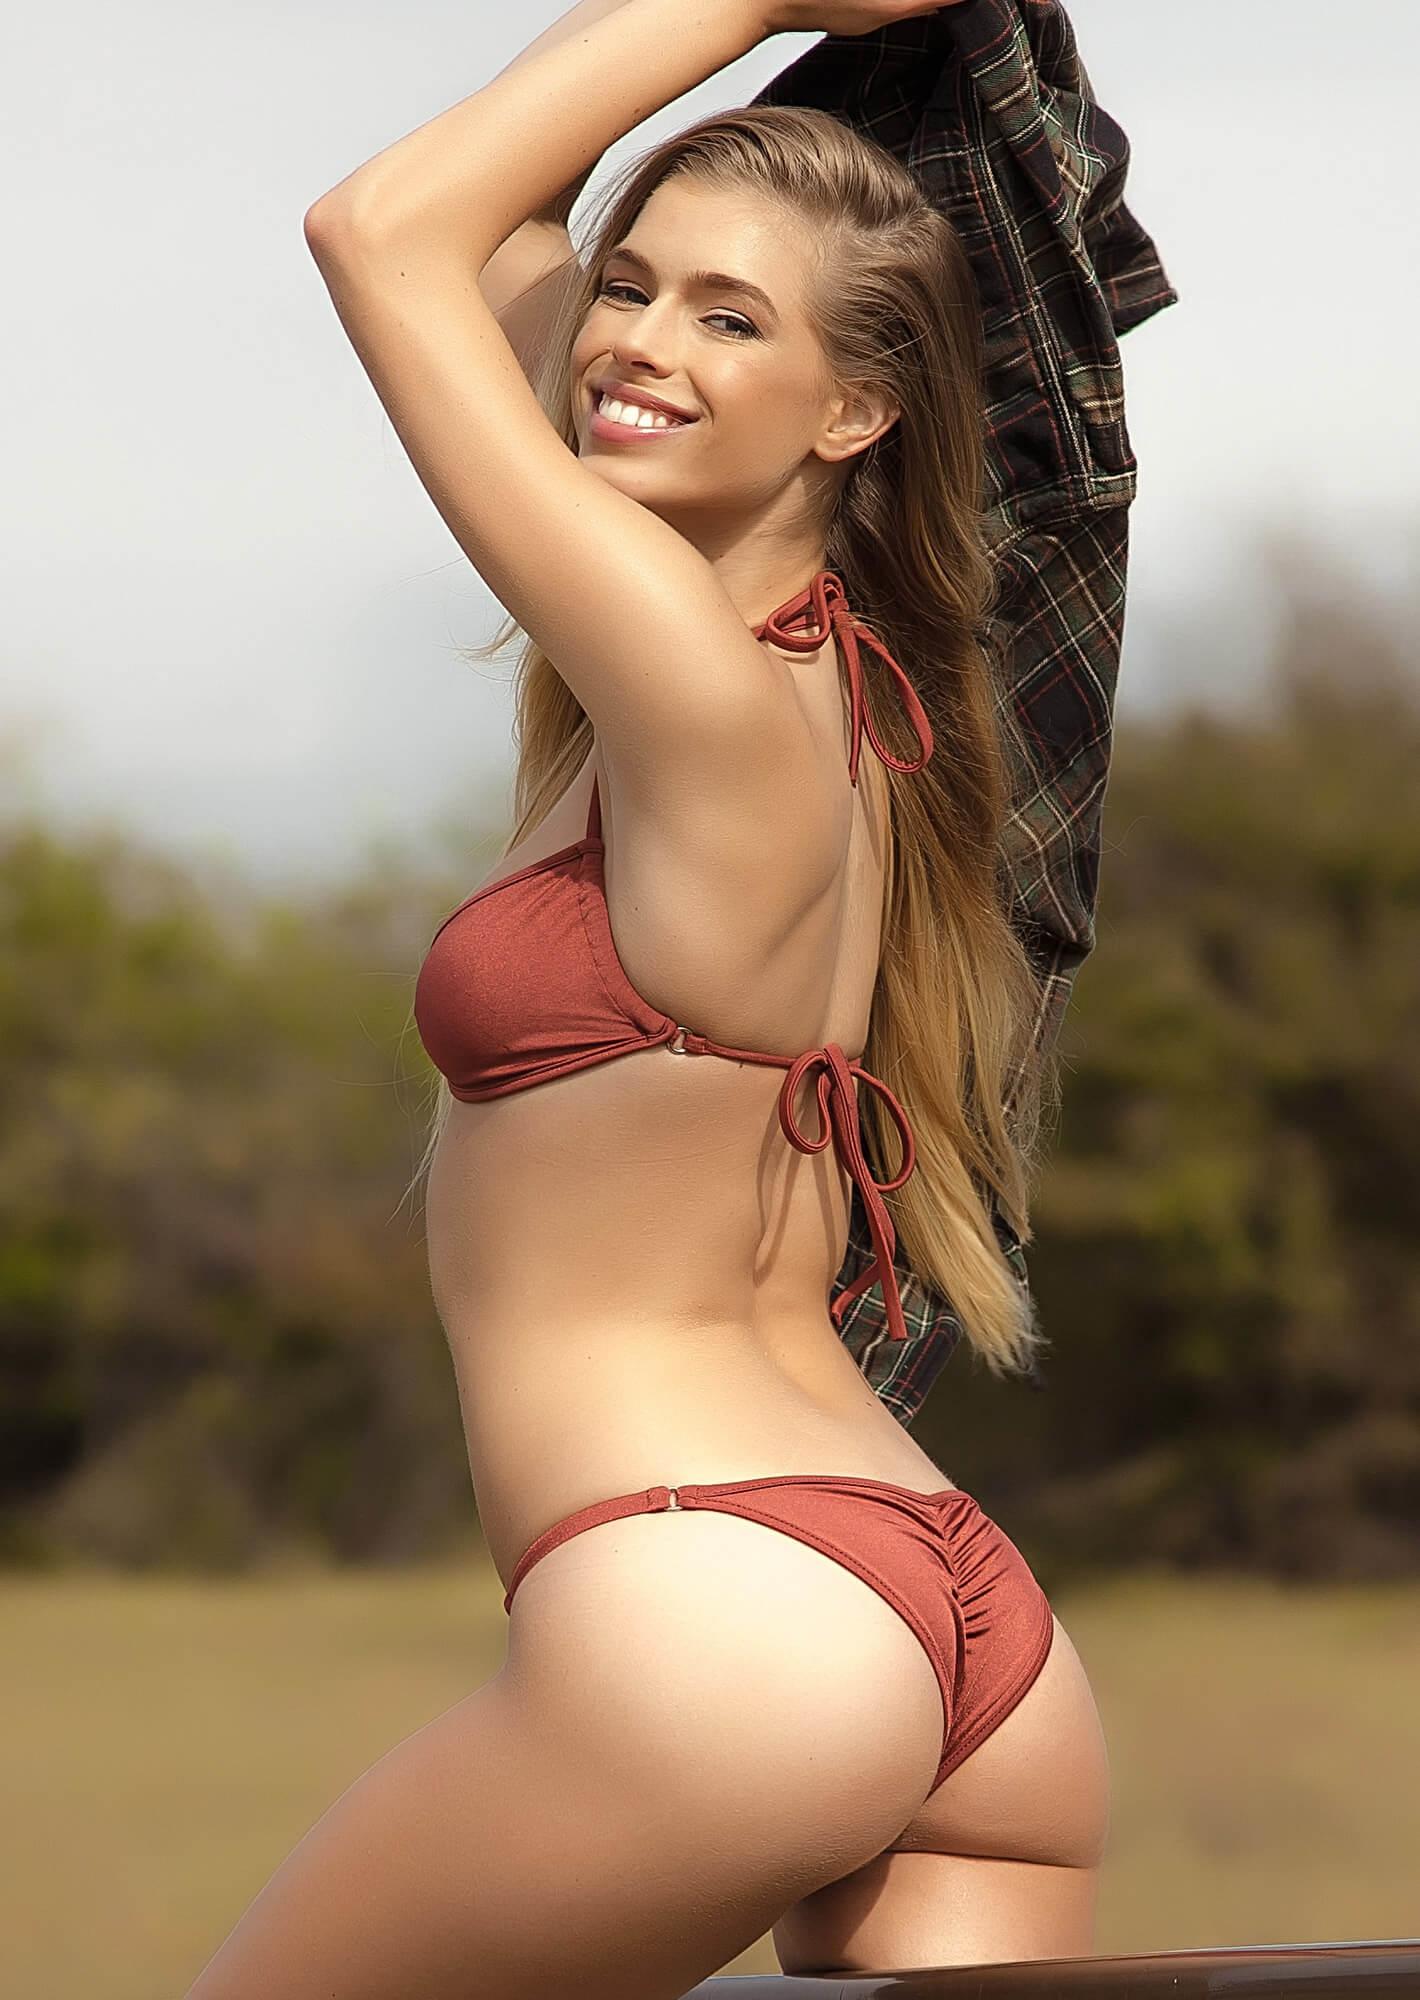 Love every a bikini brazilian amazing!